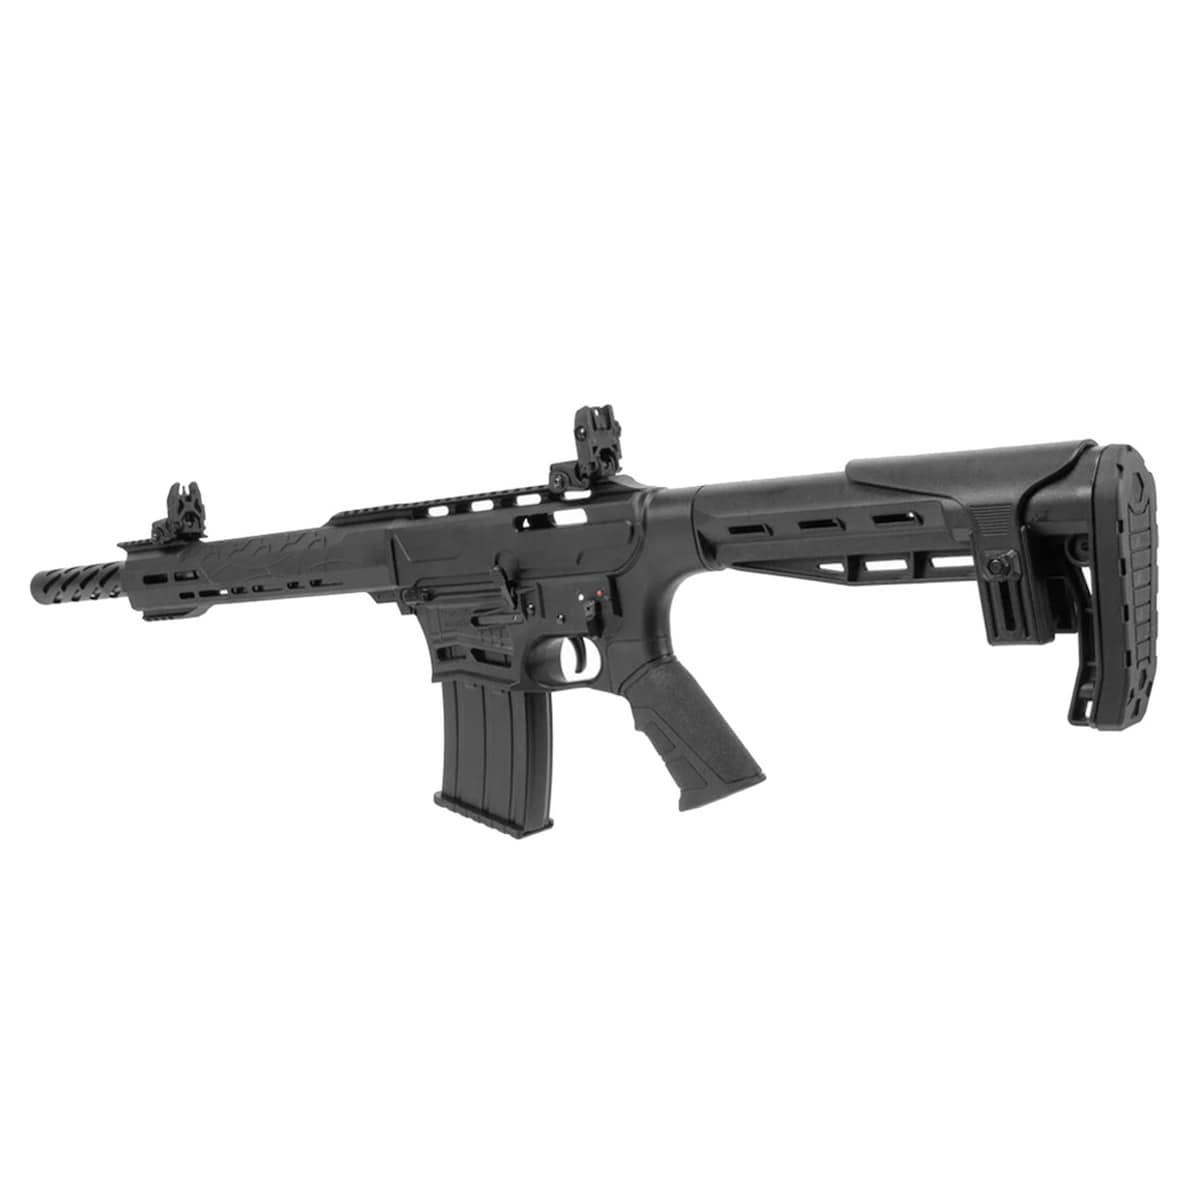 CITADEL BOSS 25 -  AR15 Style Tactical Shotgun